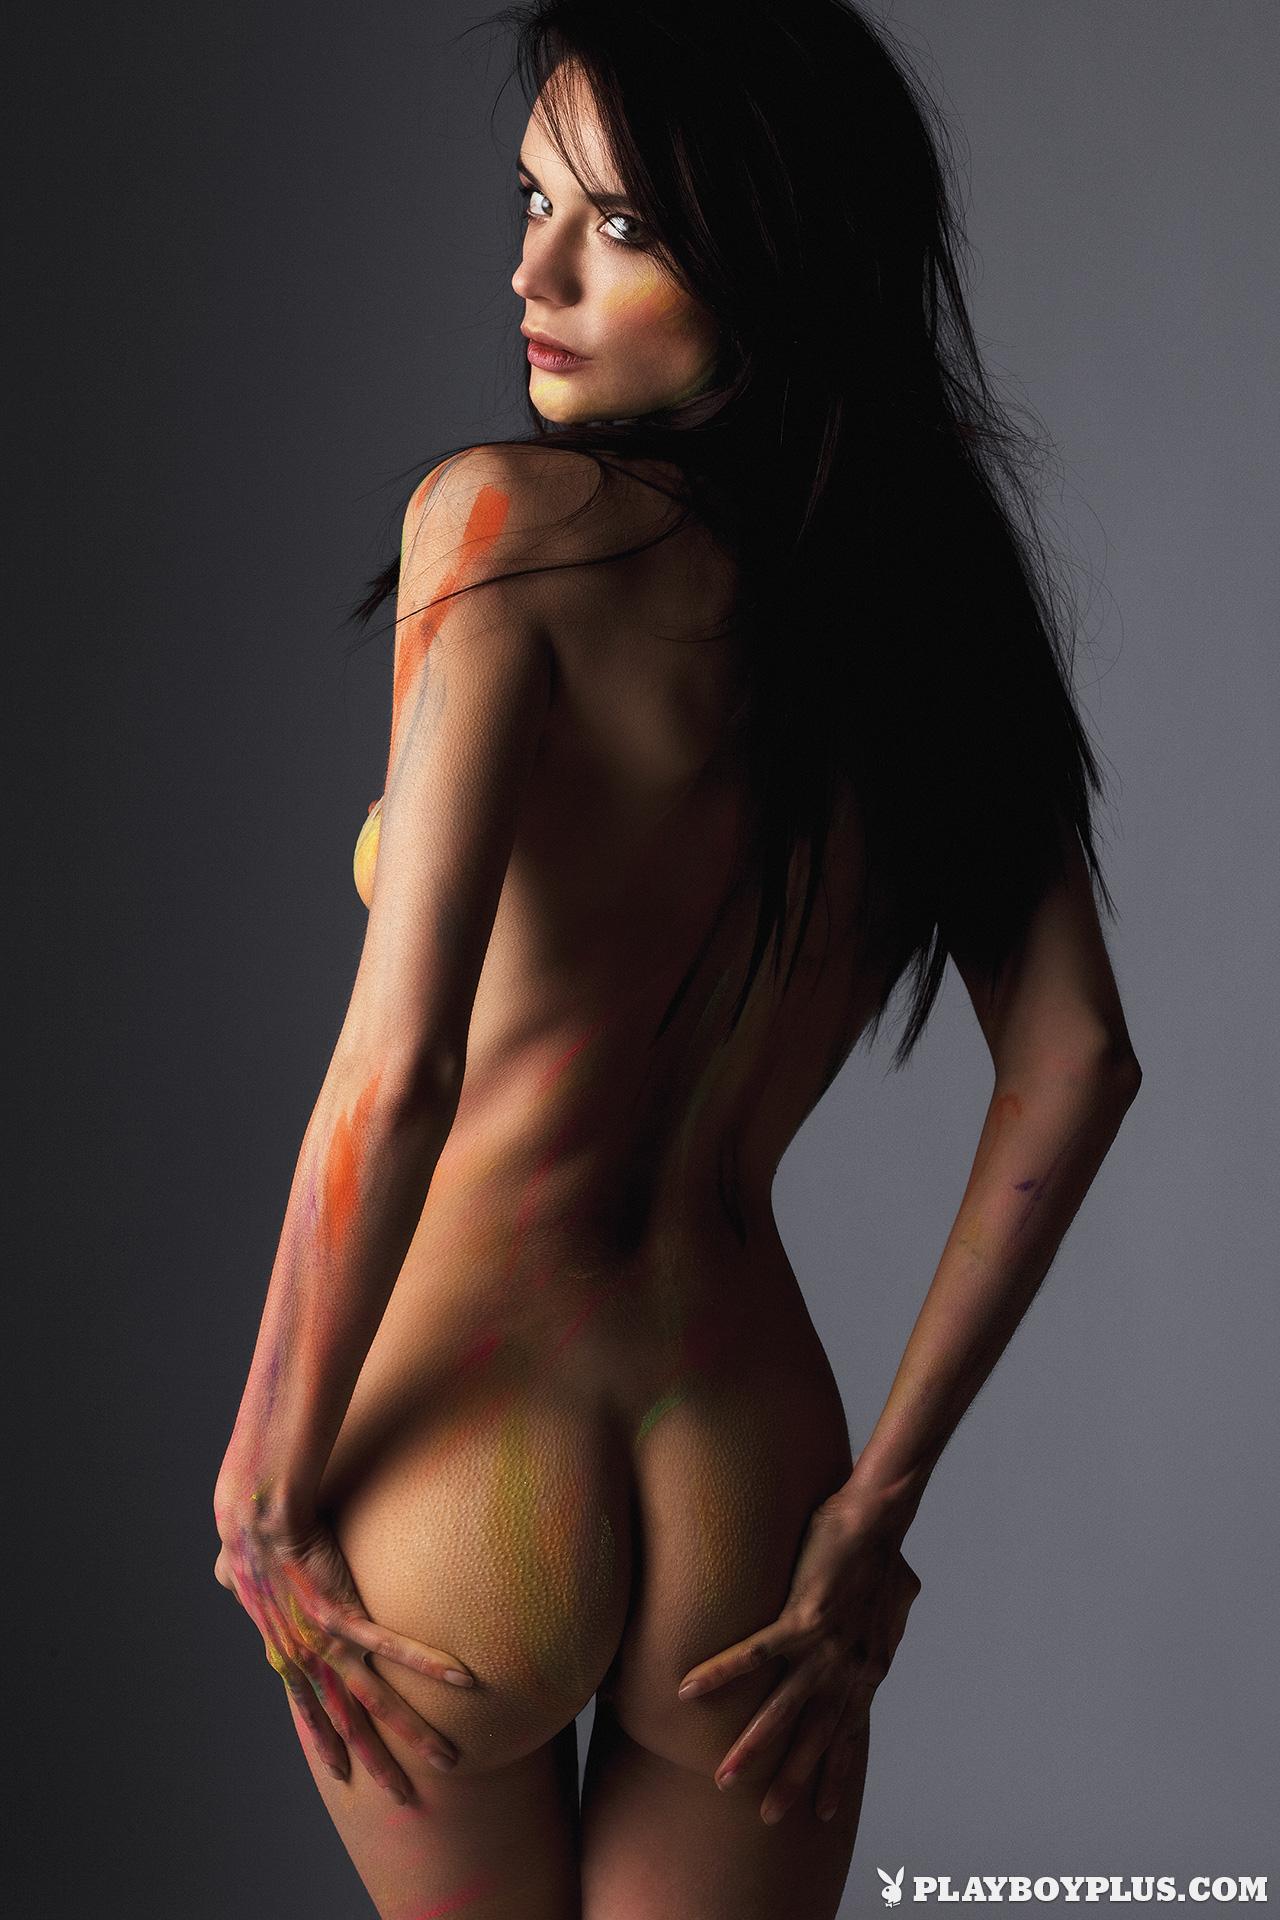 nude (79 photos), Instagram Celebrity image